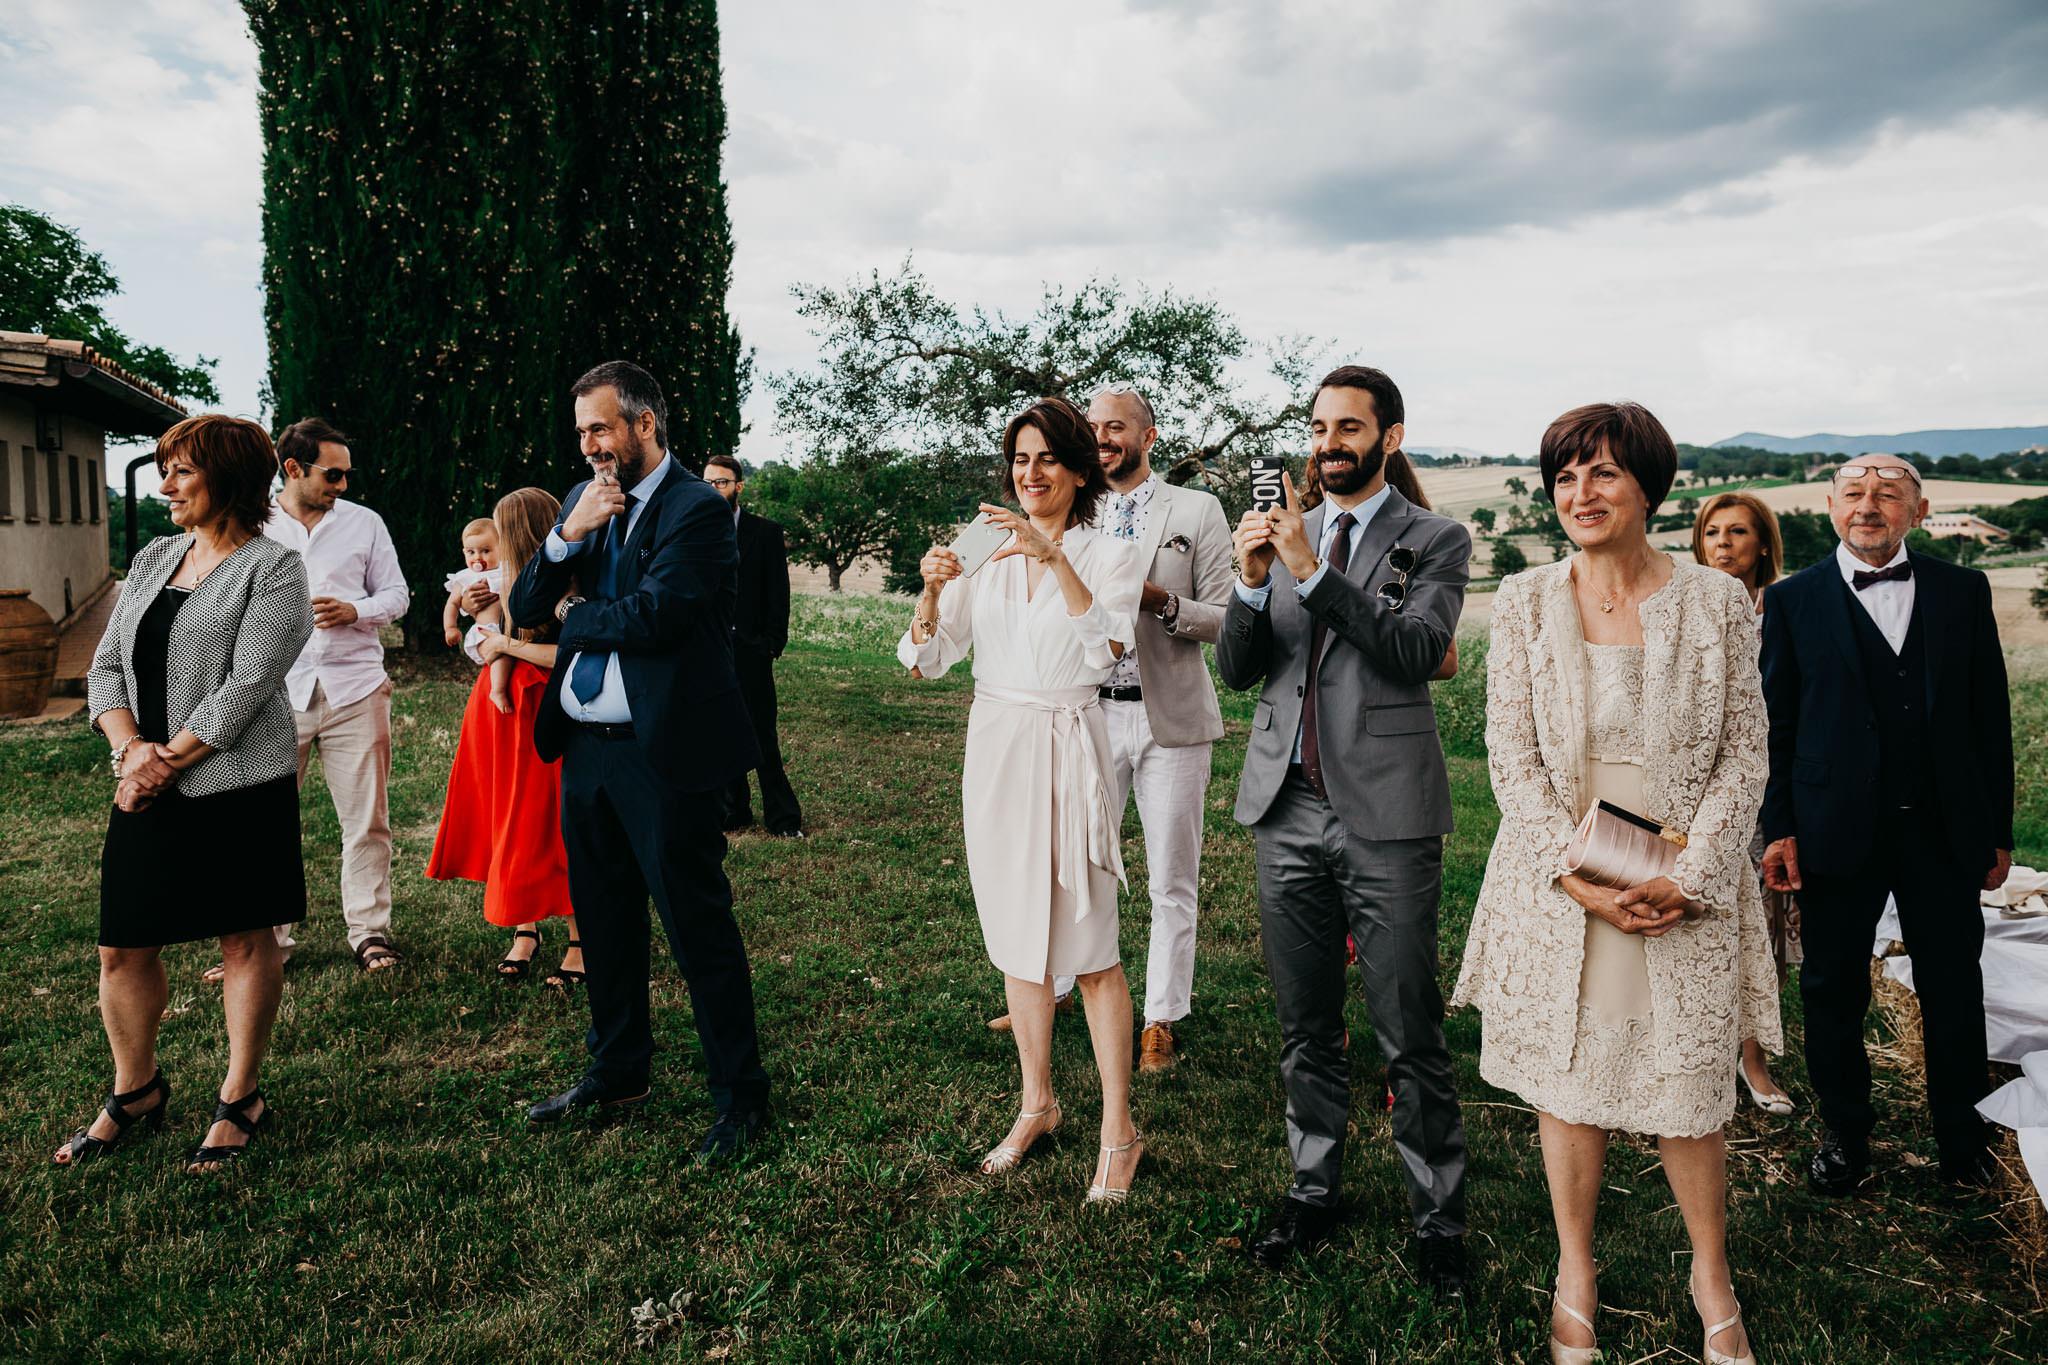 destination wedding in italy inspiration